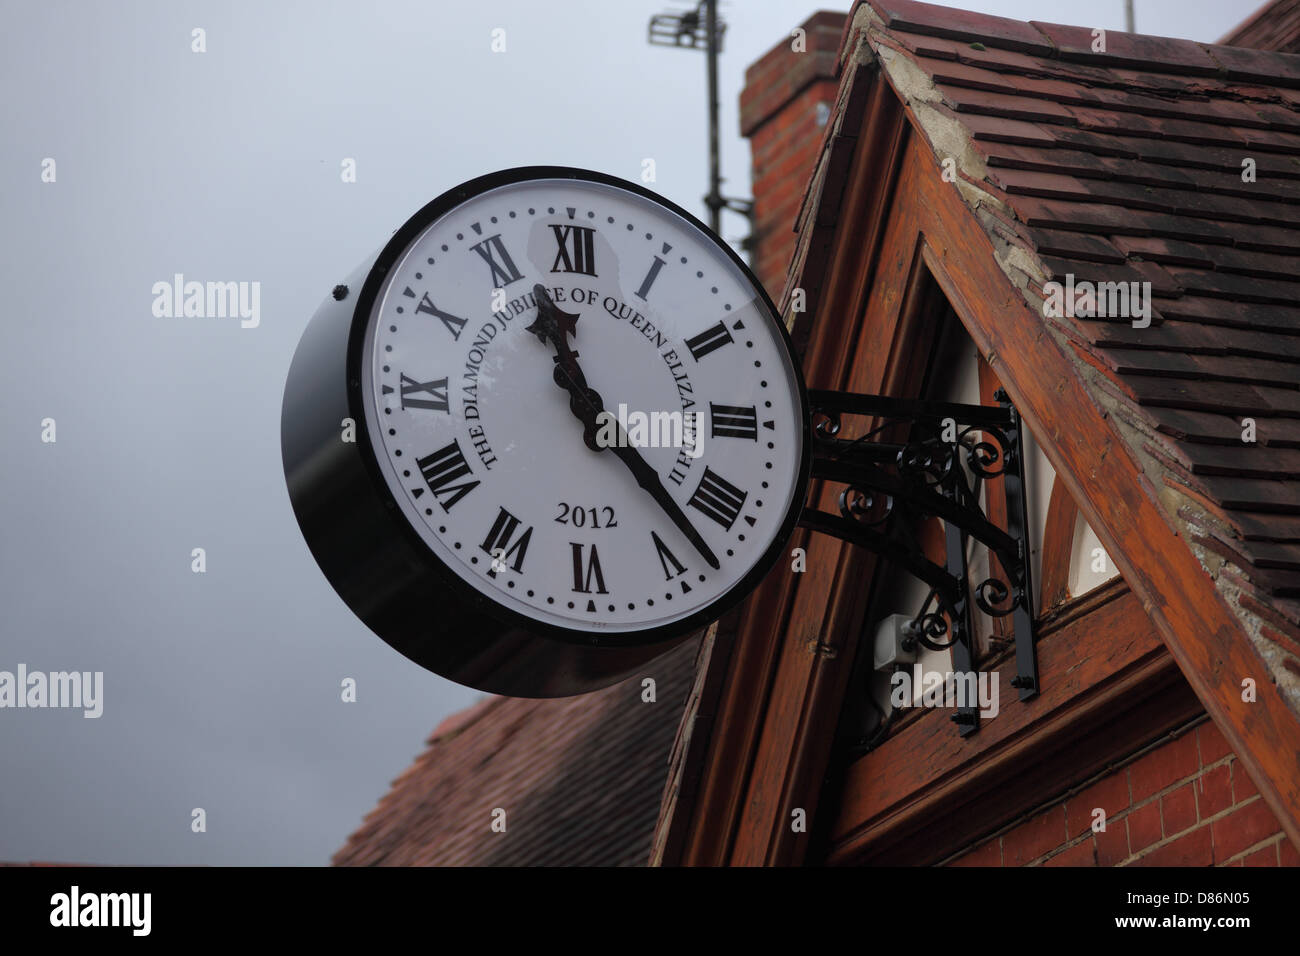 Small village commemorative clock on the village hall to commemorate the Queens Diamond Jubilee. - Stock Image